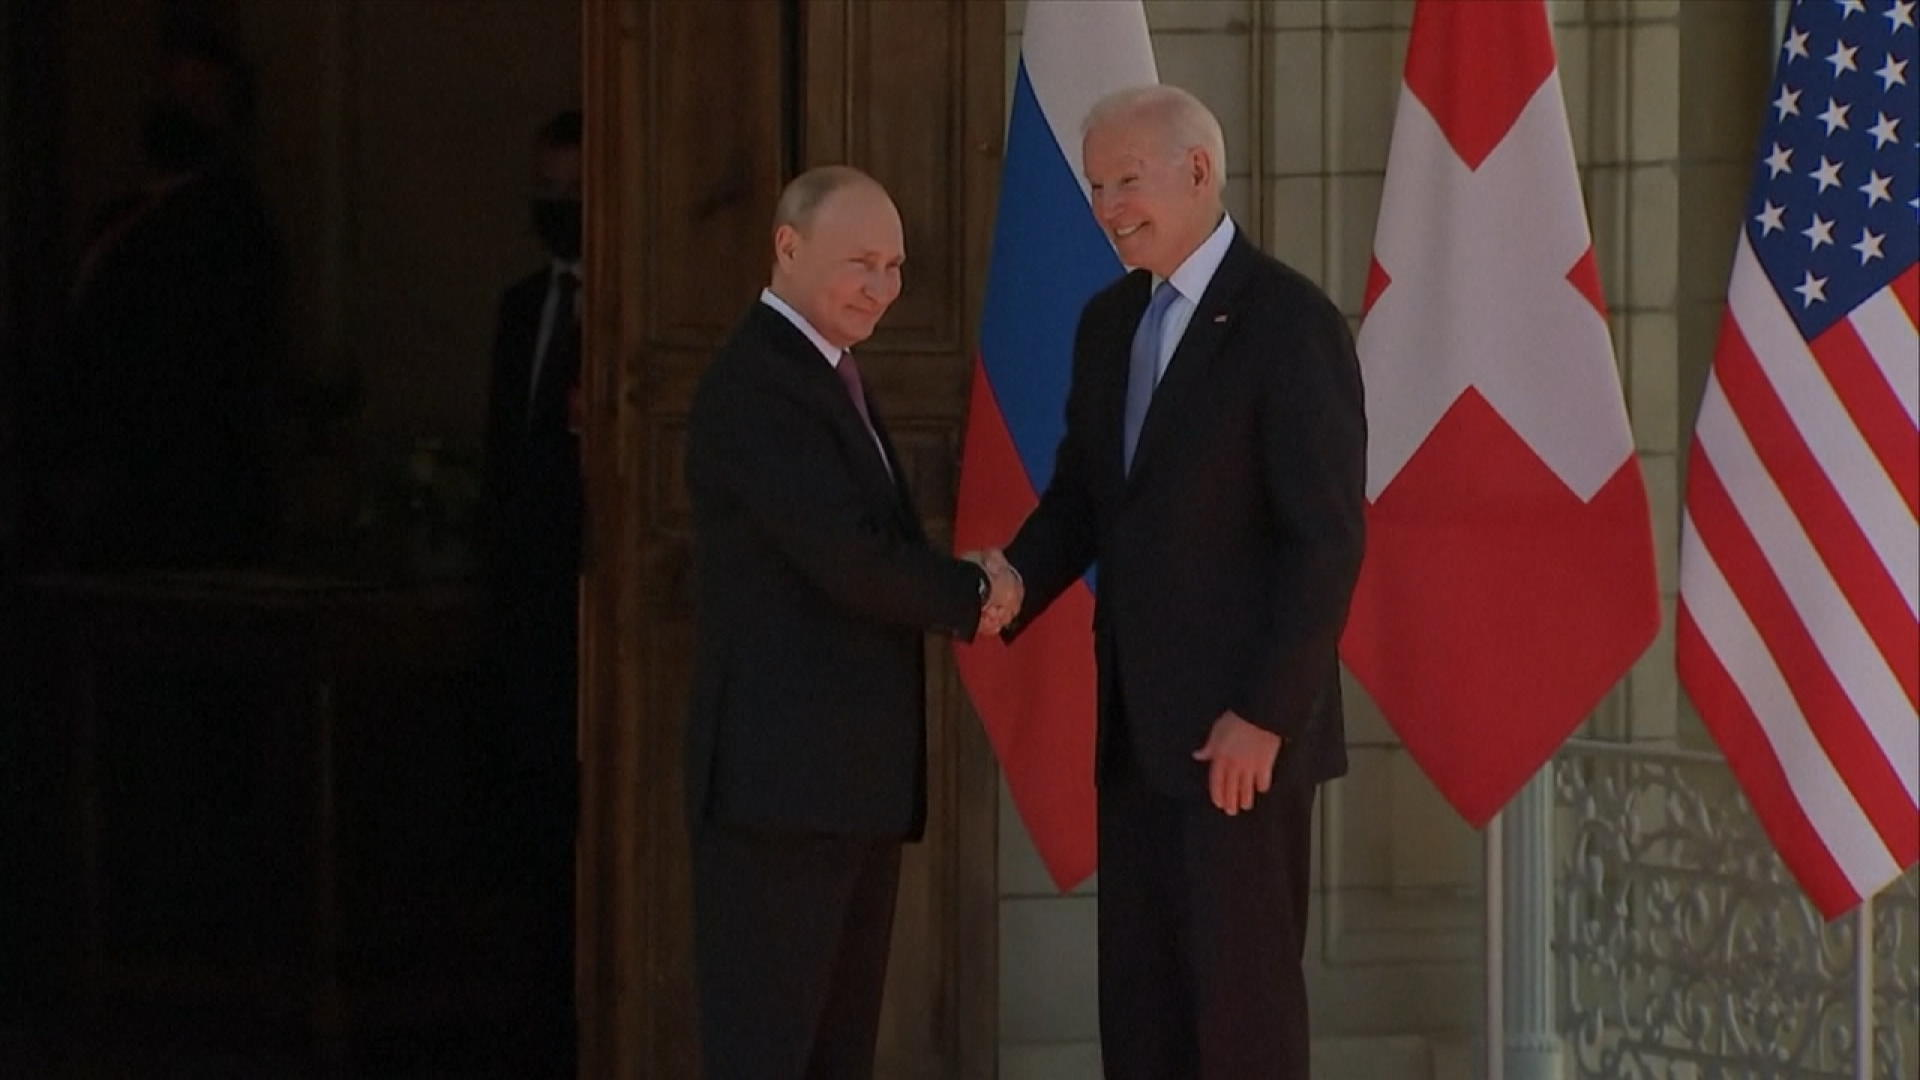 Biden, Putin Shake Hands Ahead of Swiss Summit